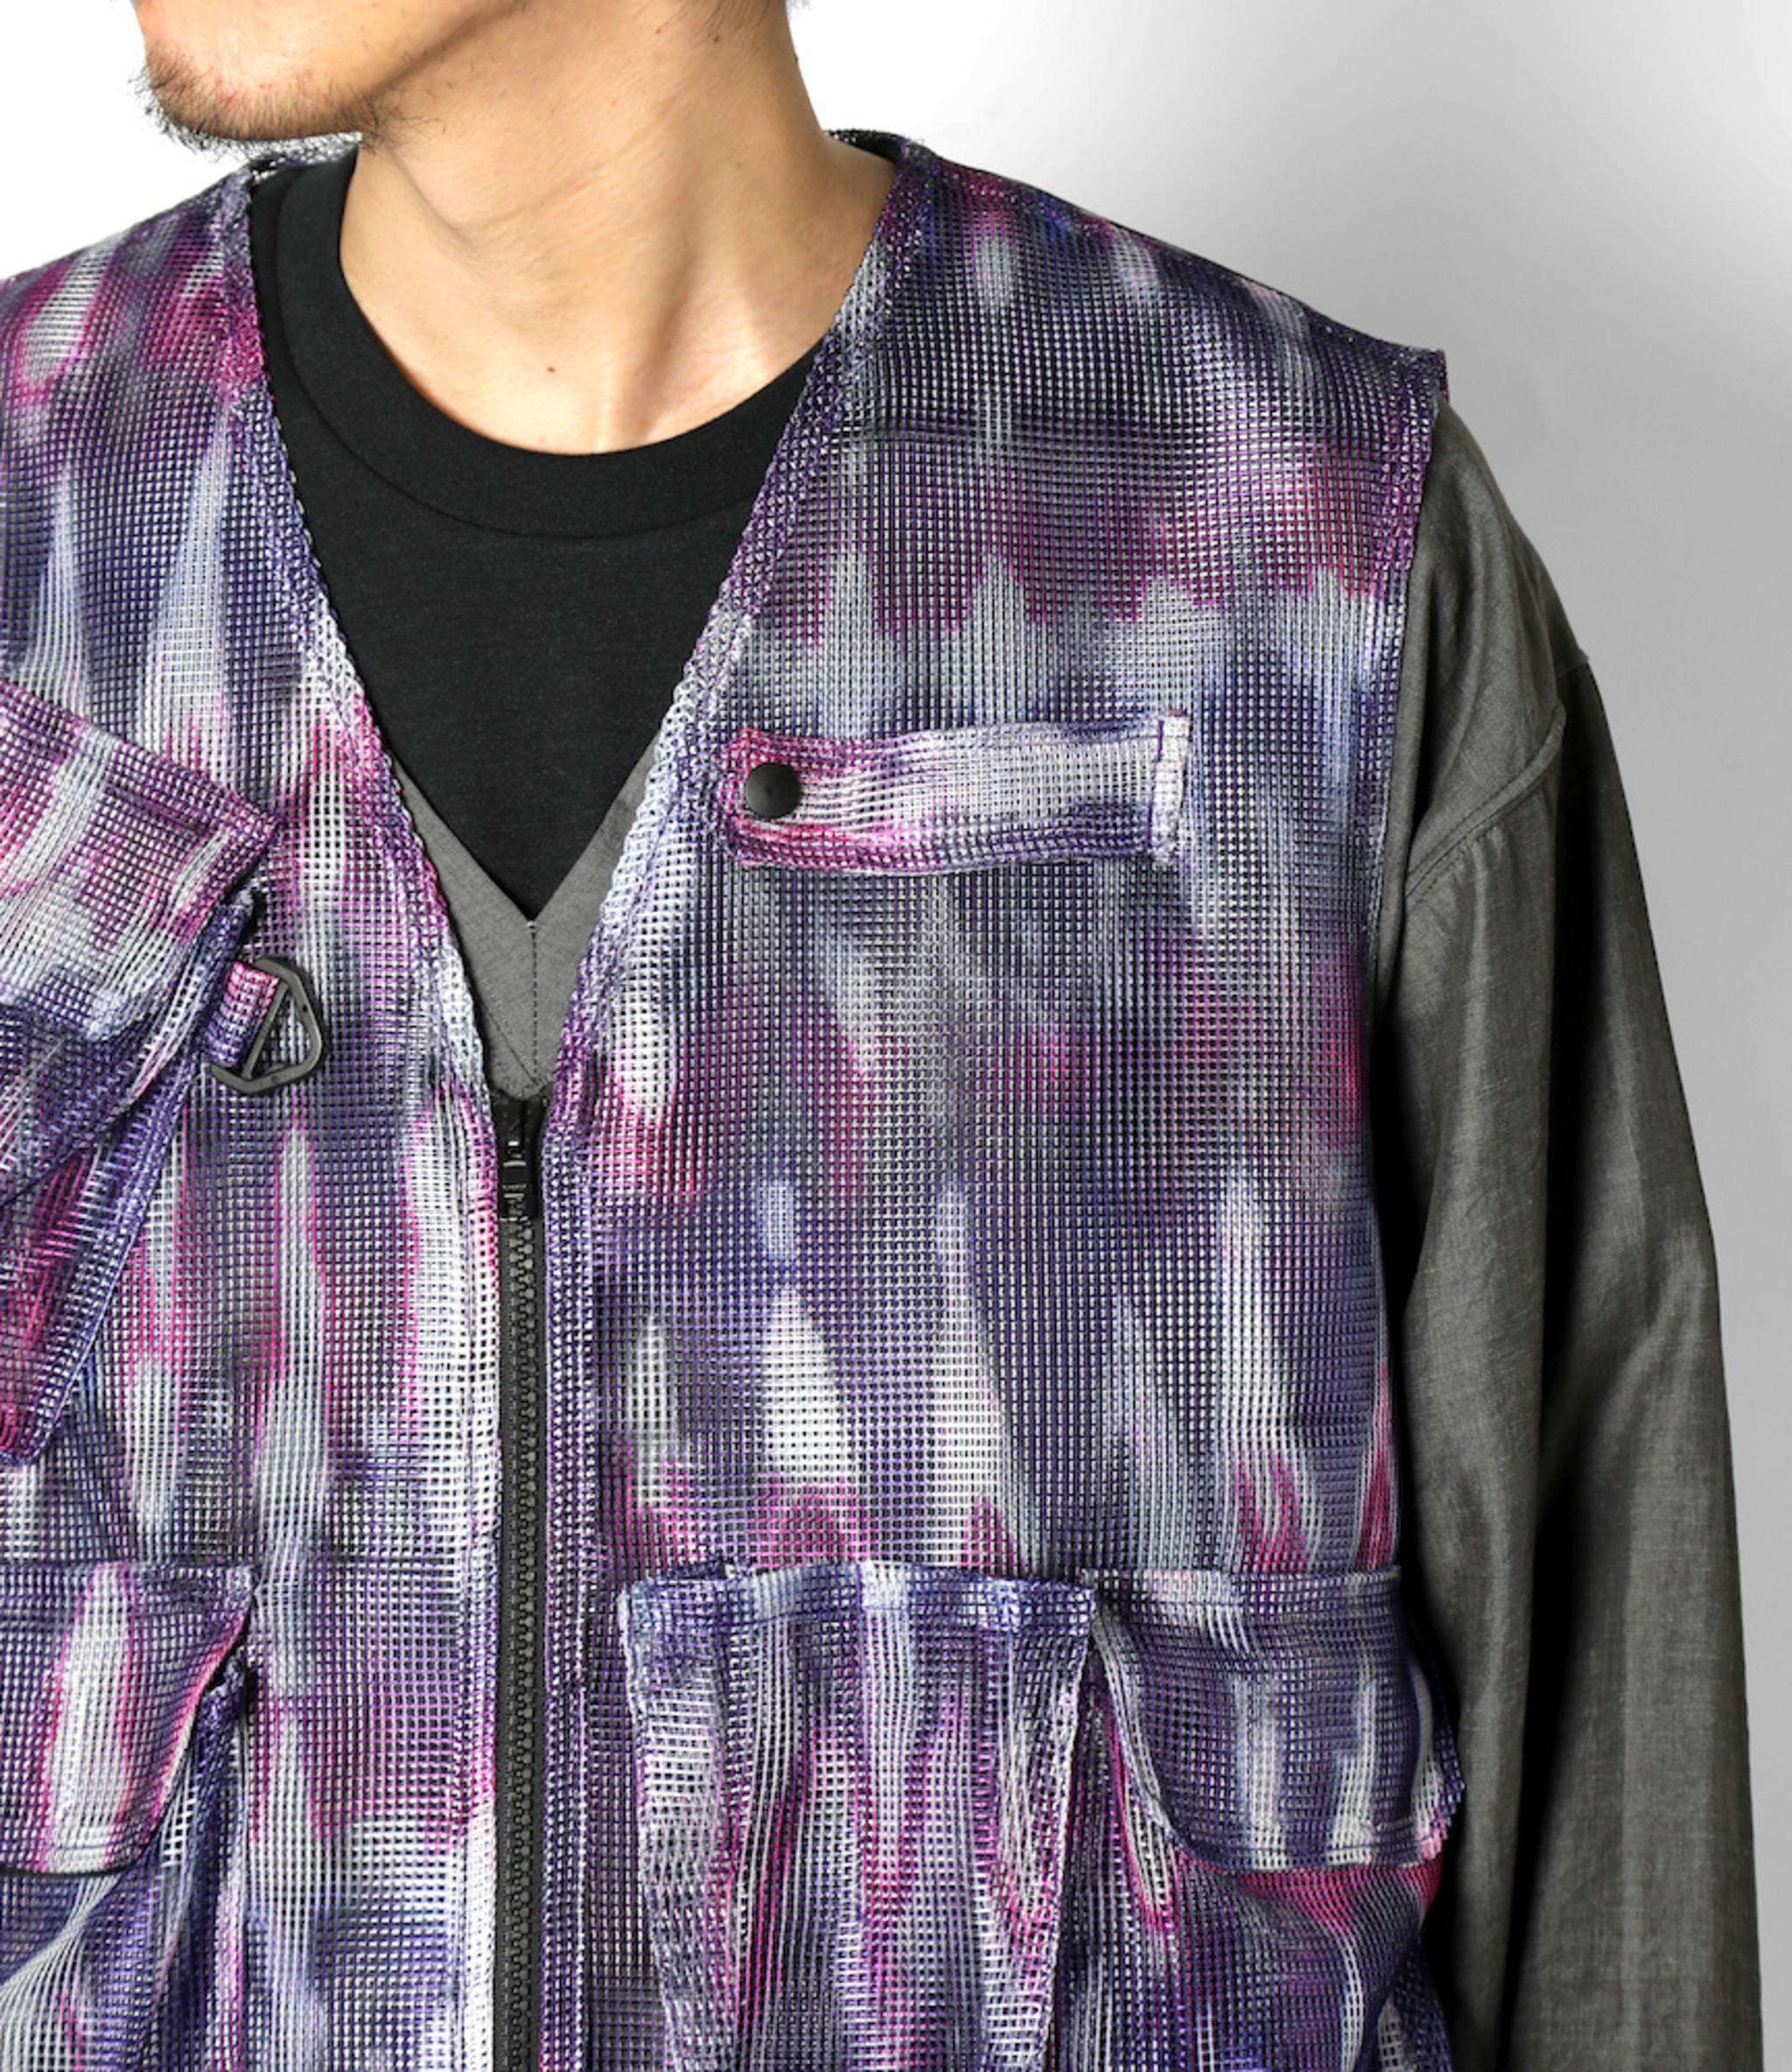 South2 West8 Mesh Bush Vest - Poly Heavyweight Mesh / Print - Tie Dye